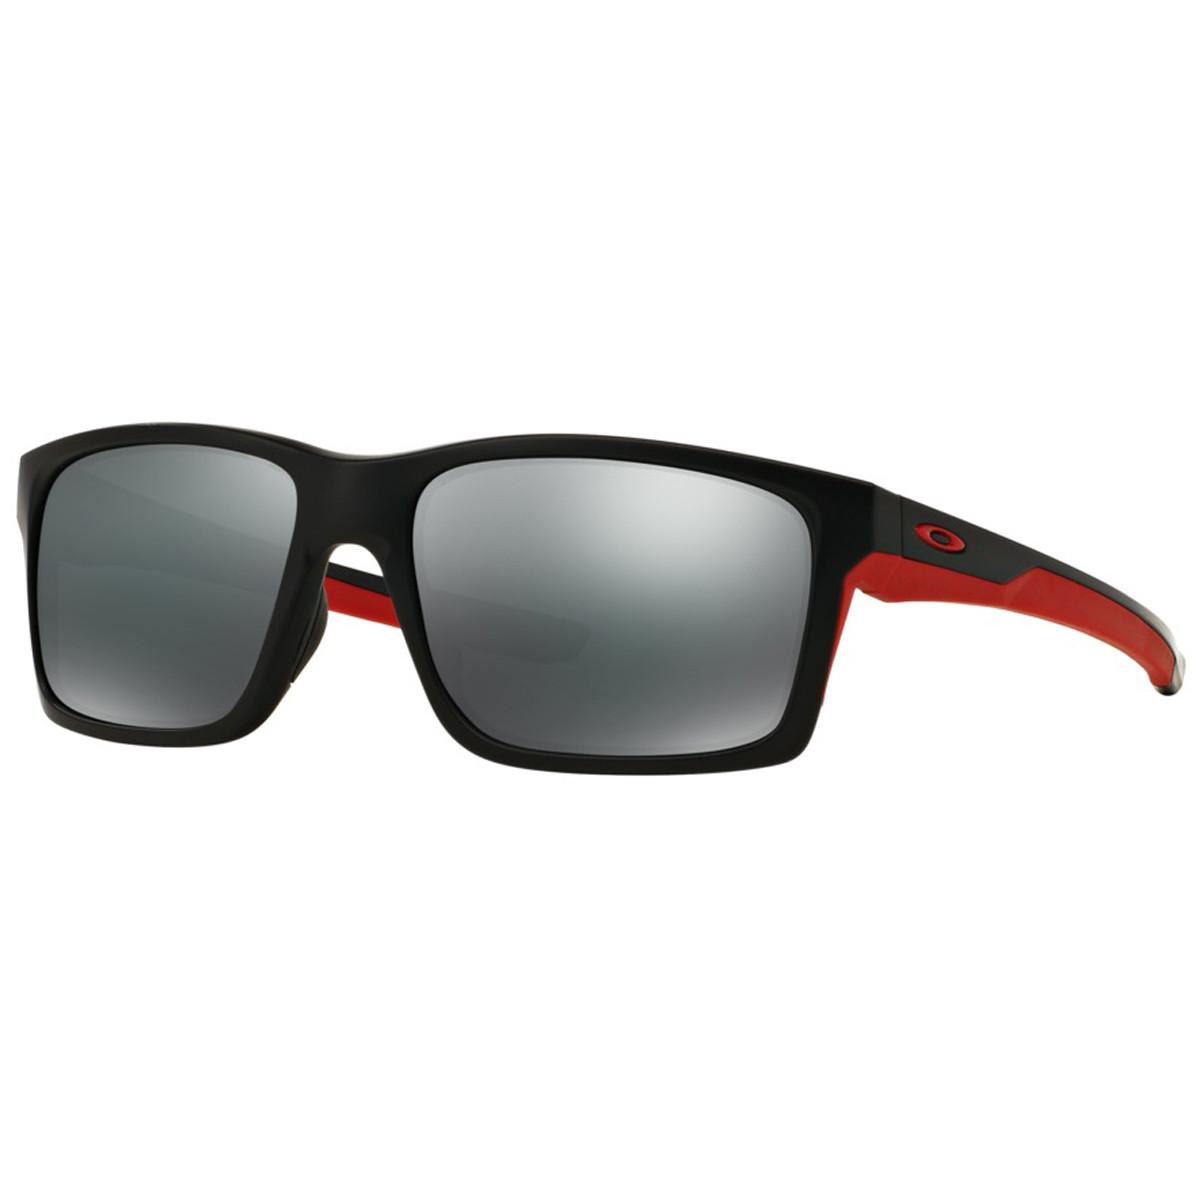 7d30082884440 Óculos Oakley Mainlink Matte Black  Lente Black Iridium ref OO9264-12